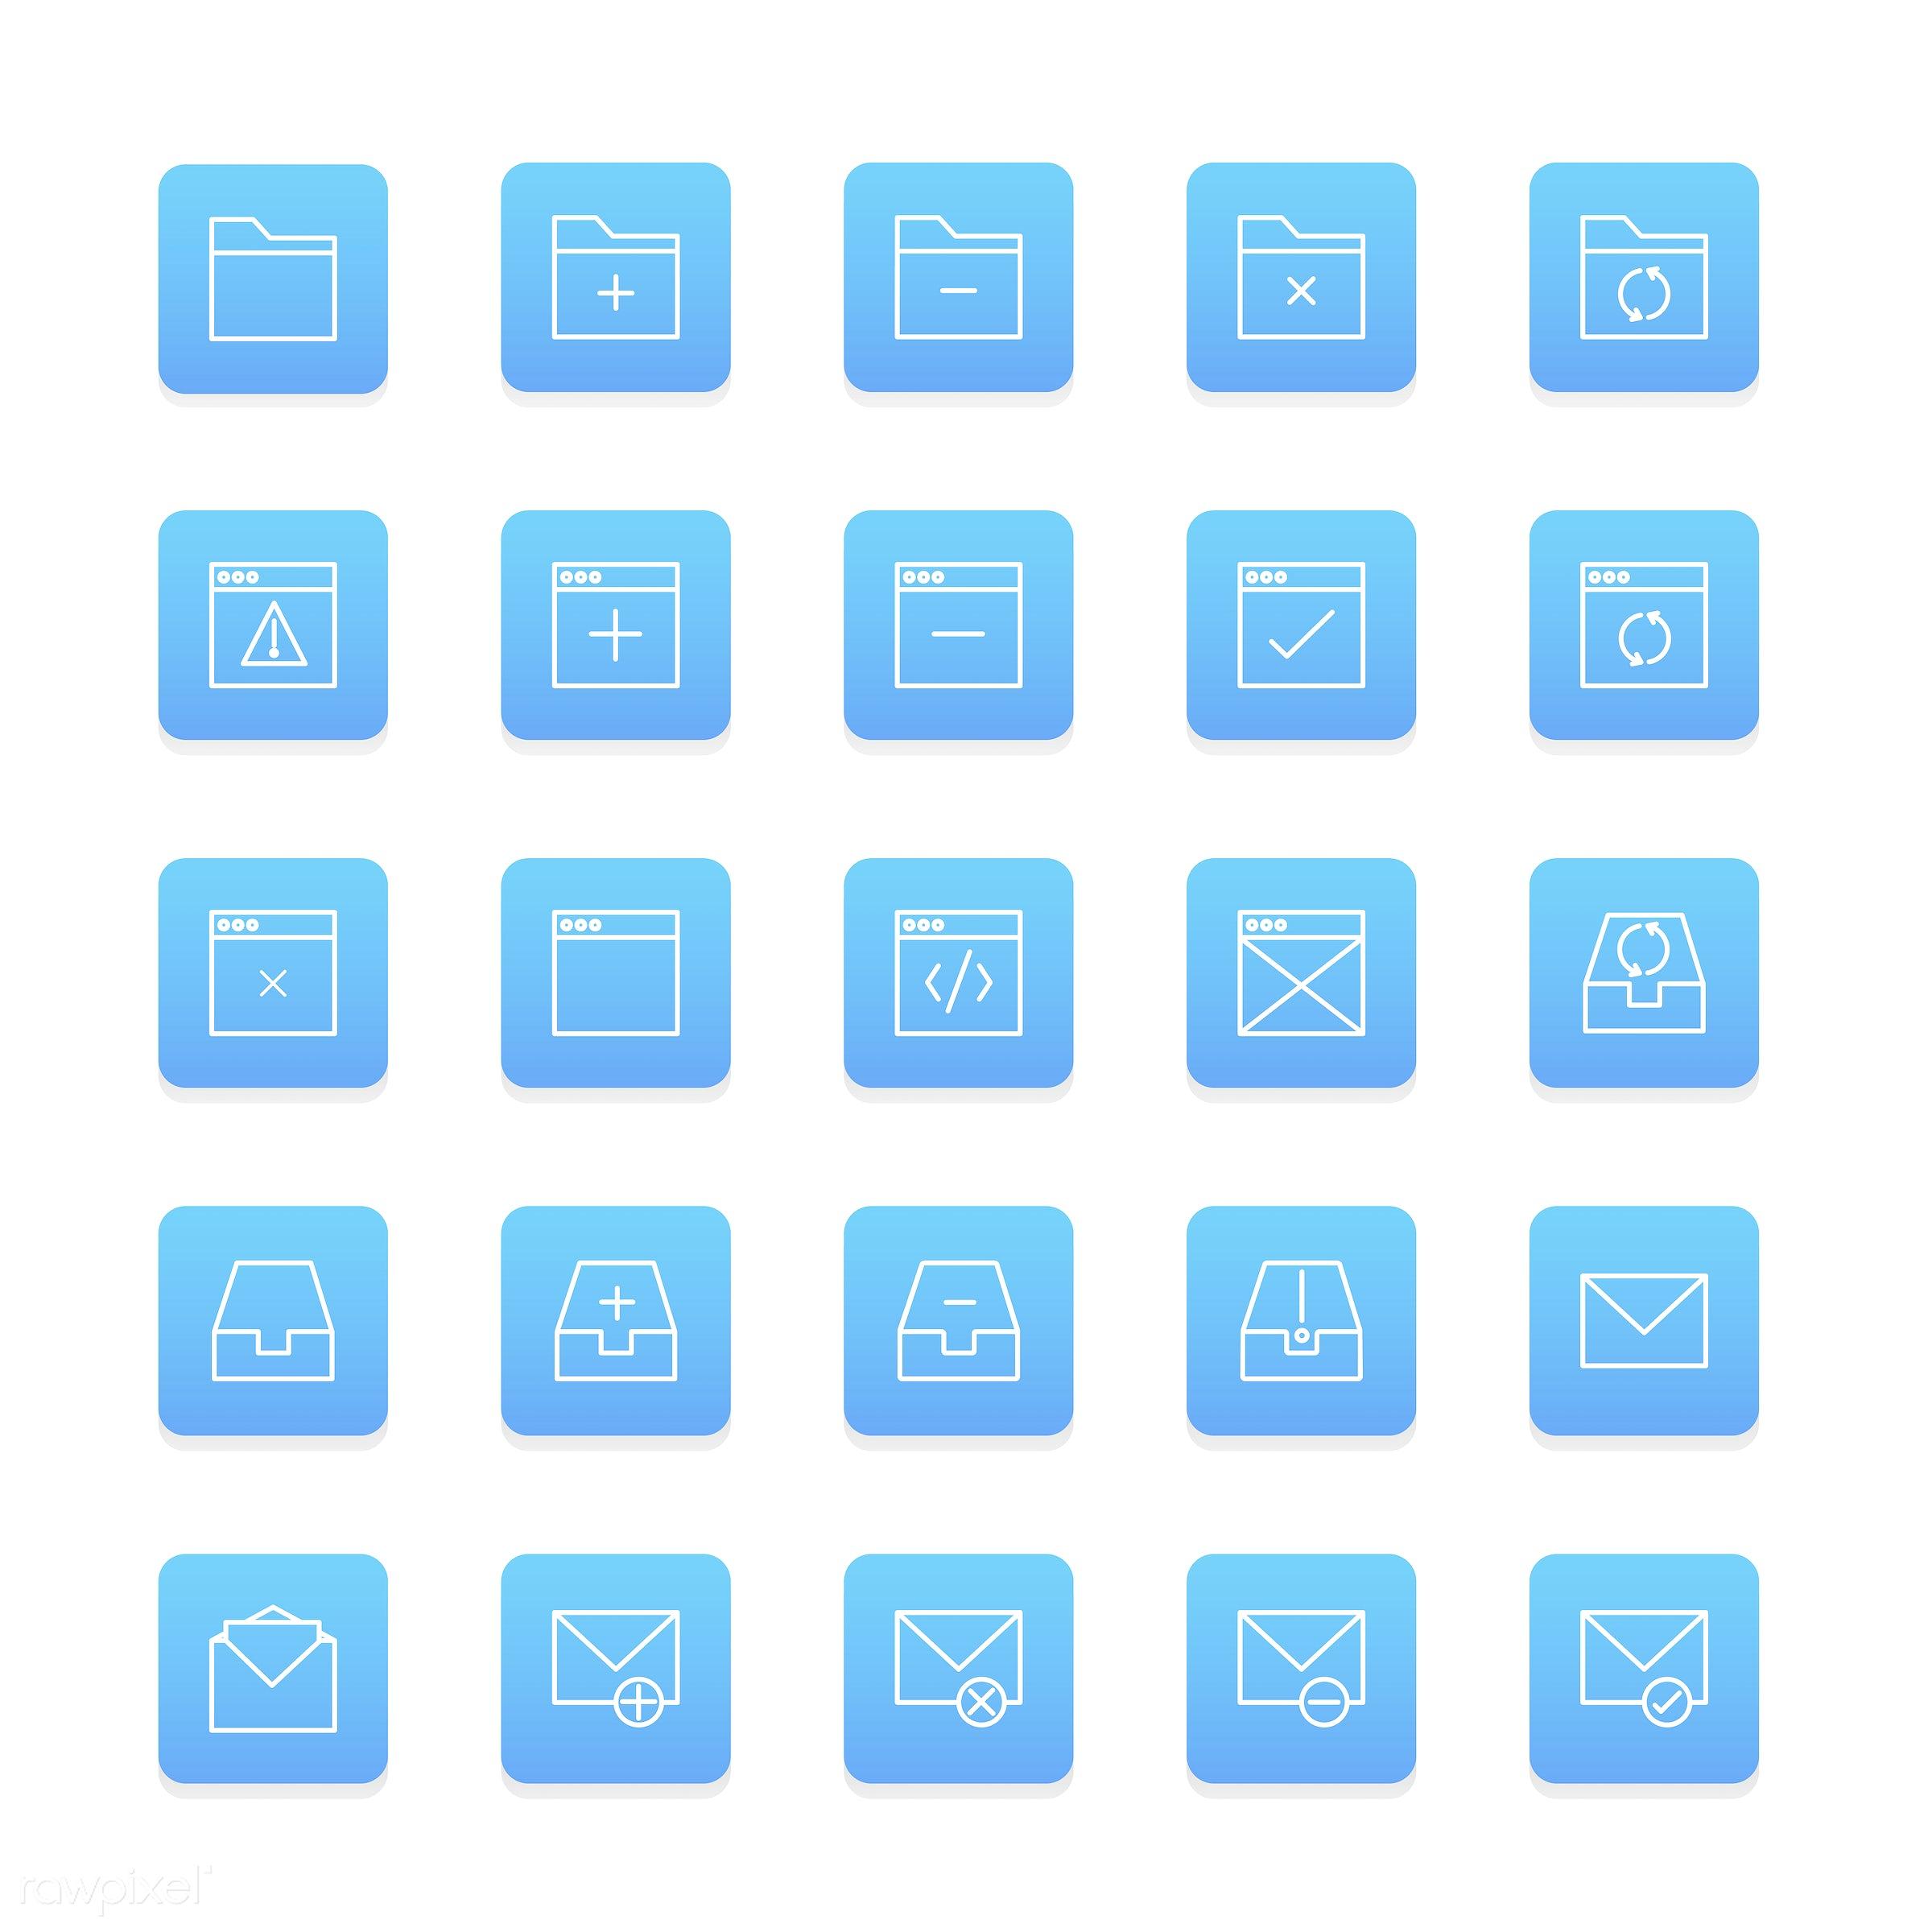 Vector set of folder icon - collection, design, flat, graphic, icon, illustration, isolated, layout, platform, set, style,...